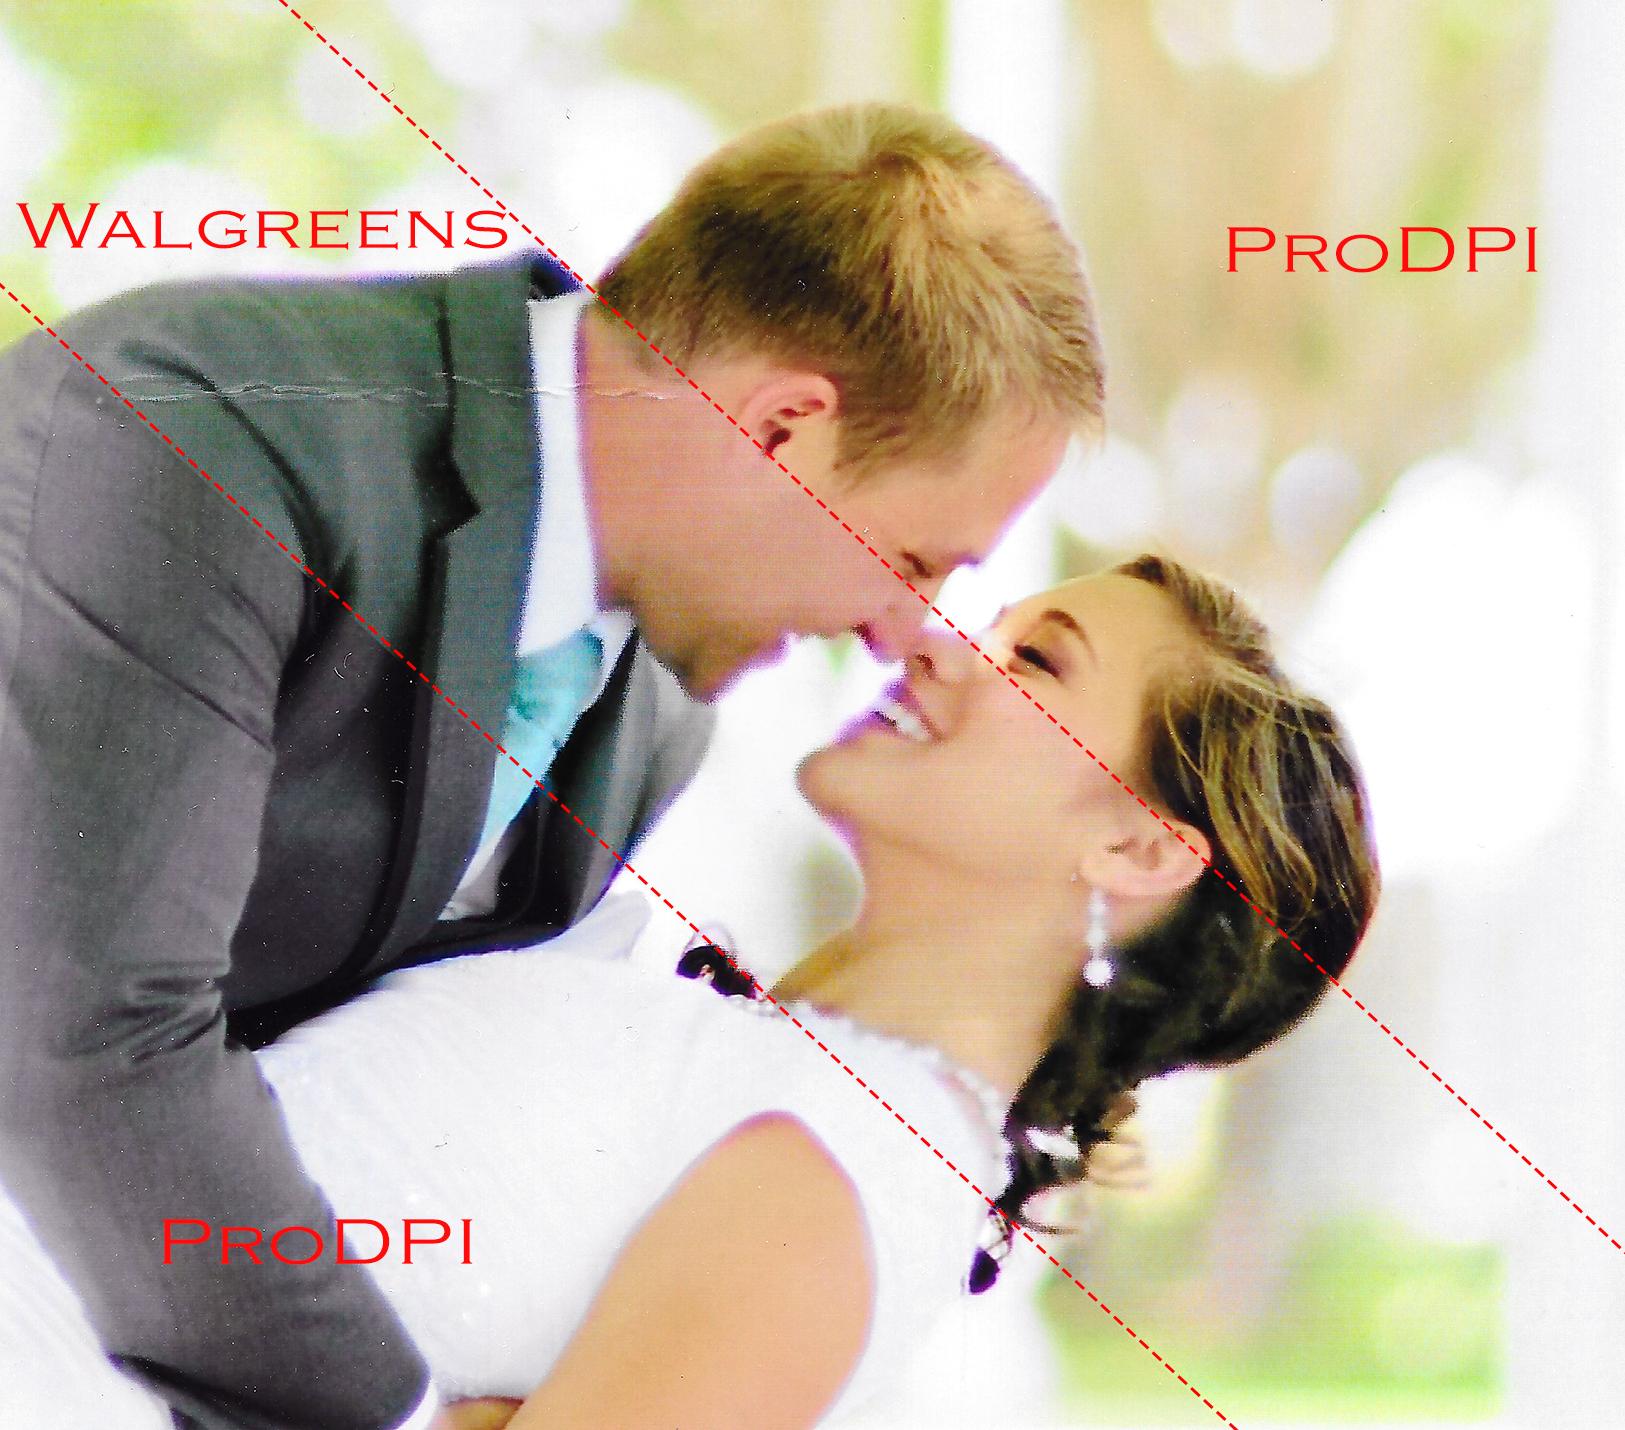 Comparison of same photo printed through Walgreens and ProDPI